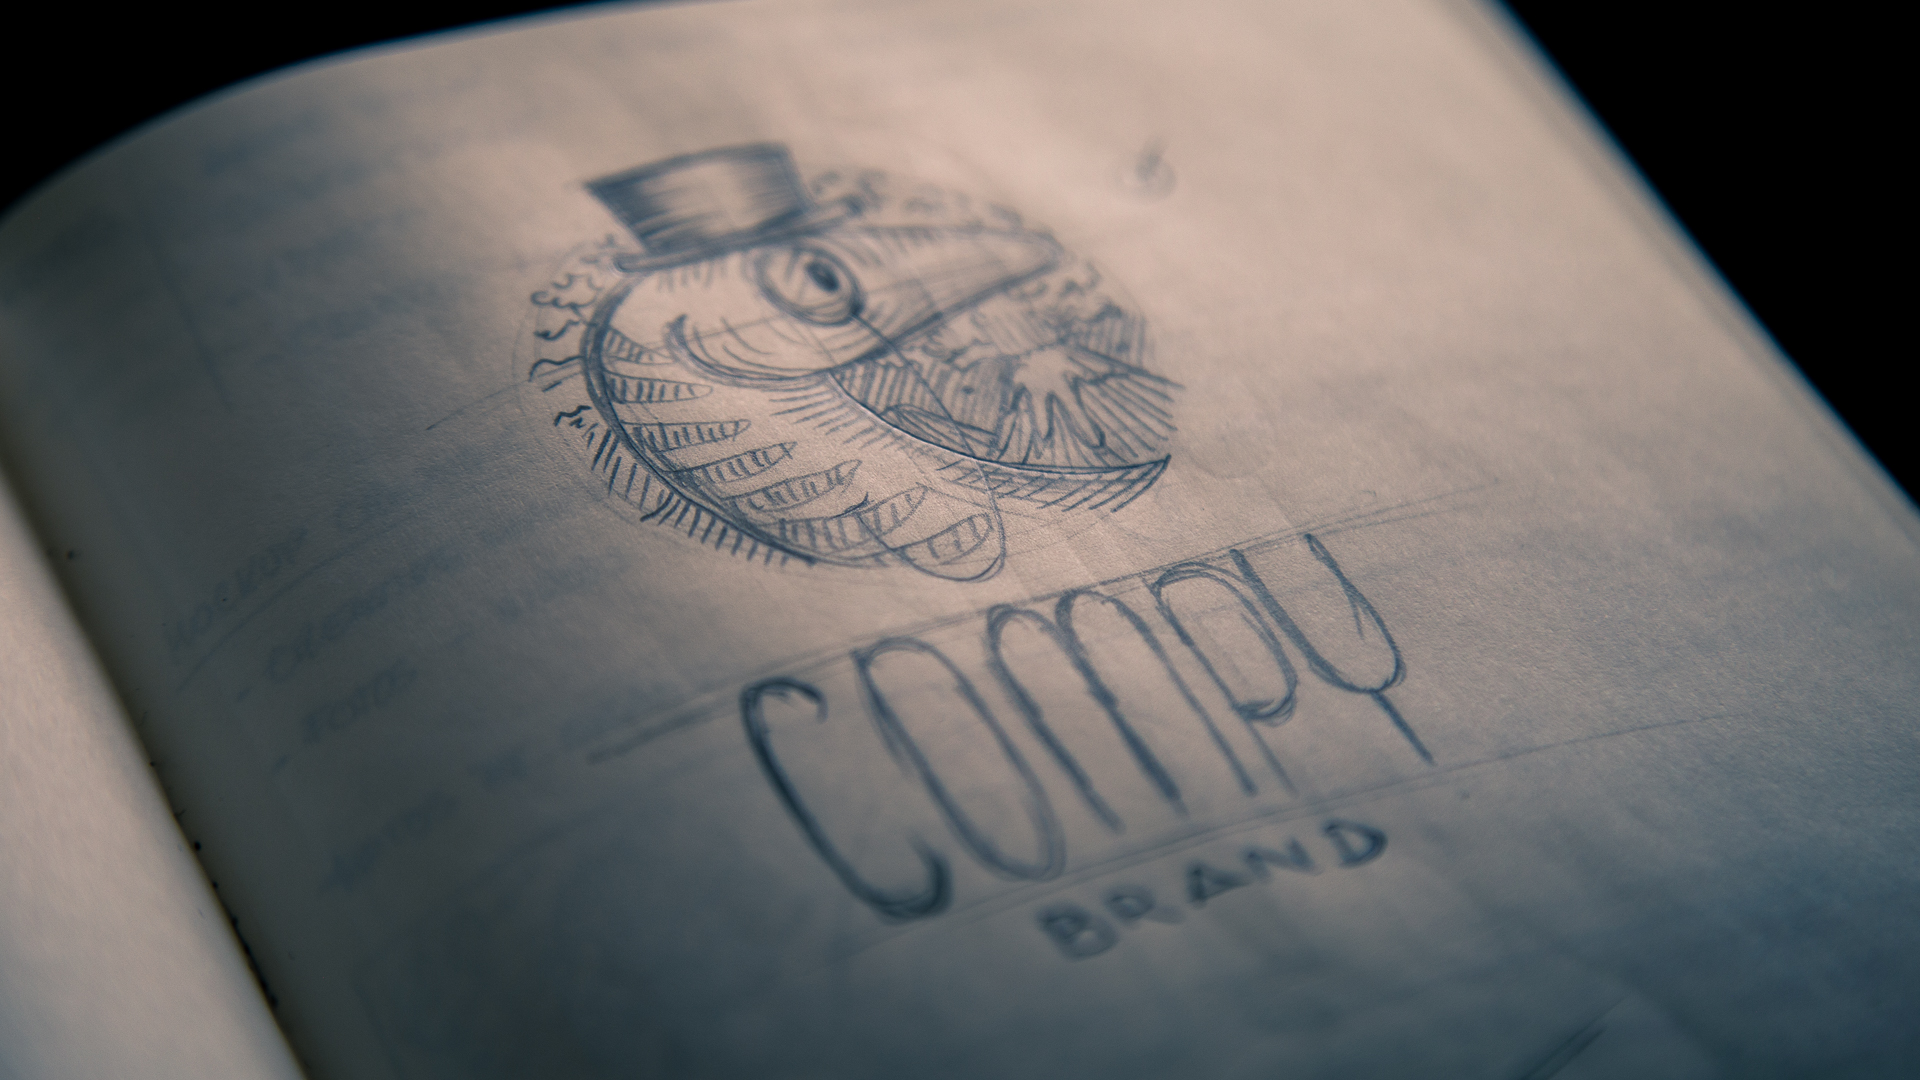 Compy Brand